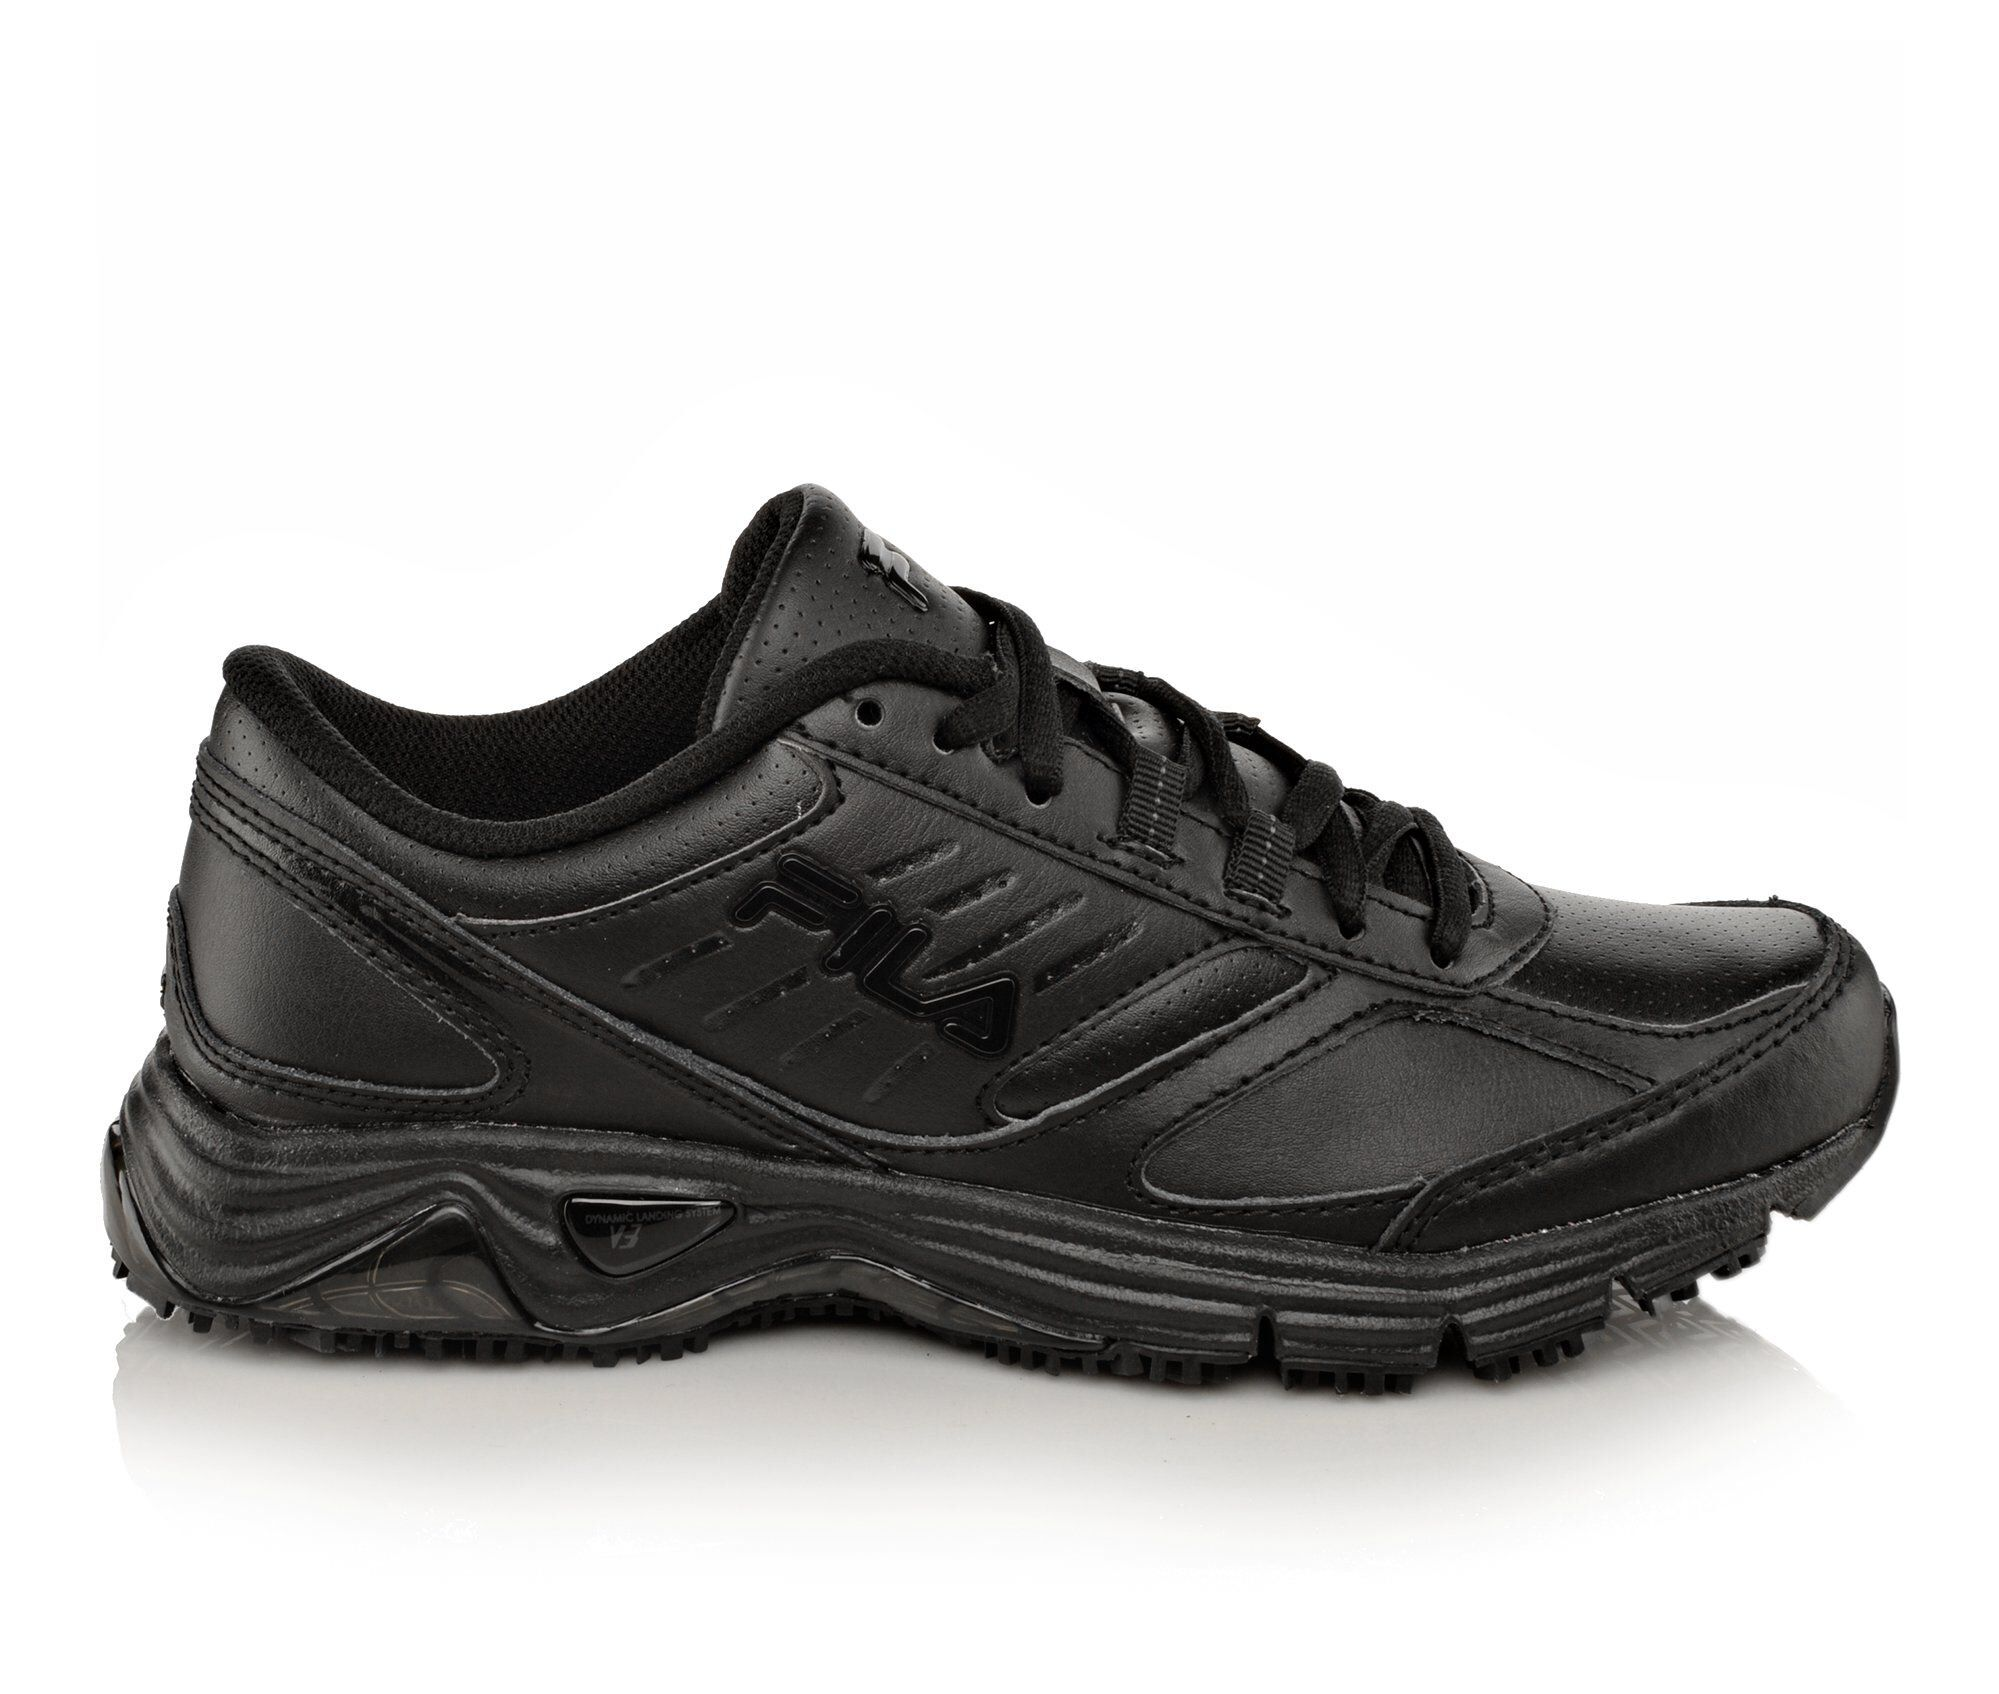 Slip Resistant Shoes for Women | Non